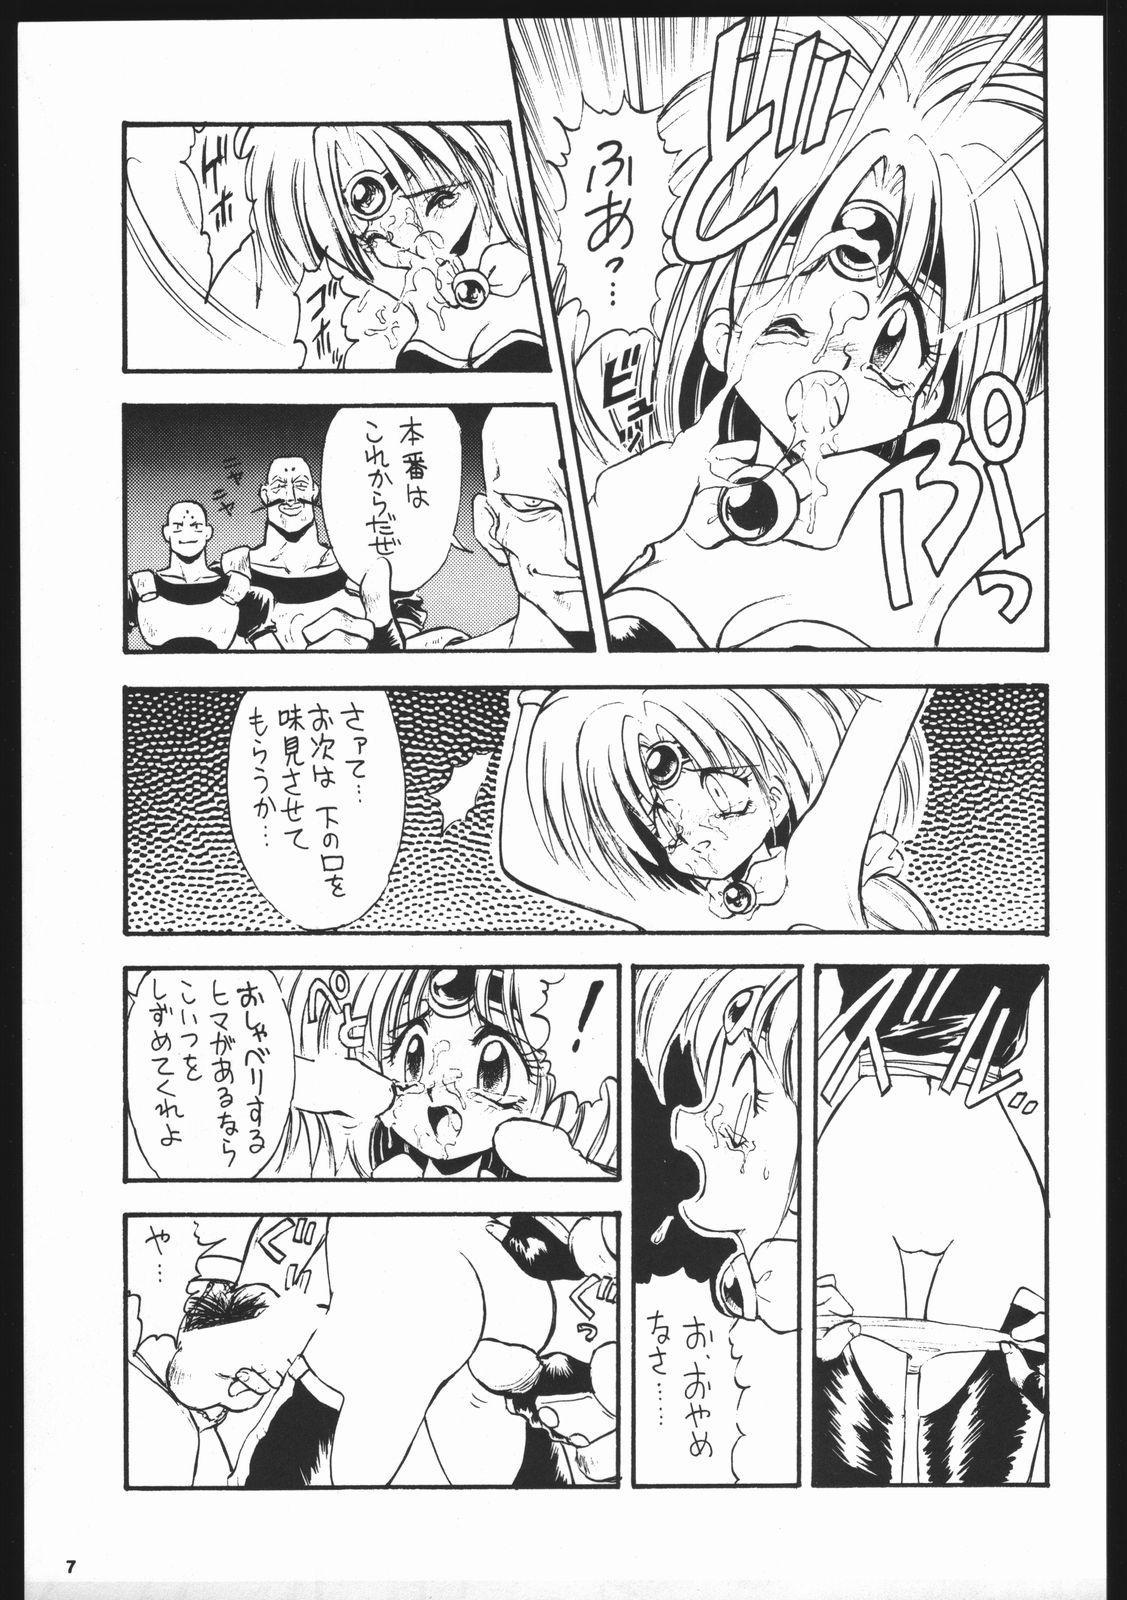 Dance of Princess S 5